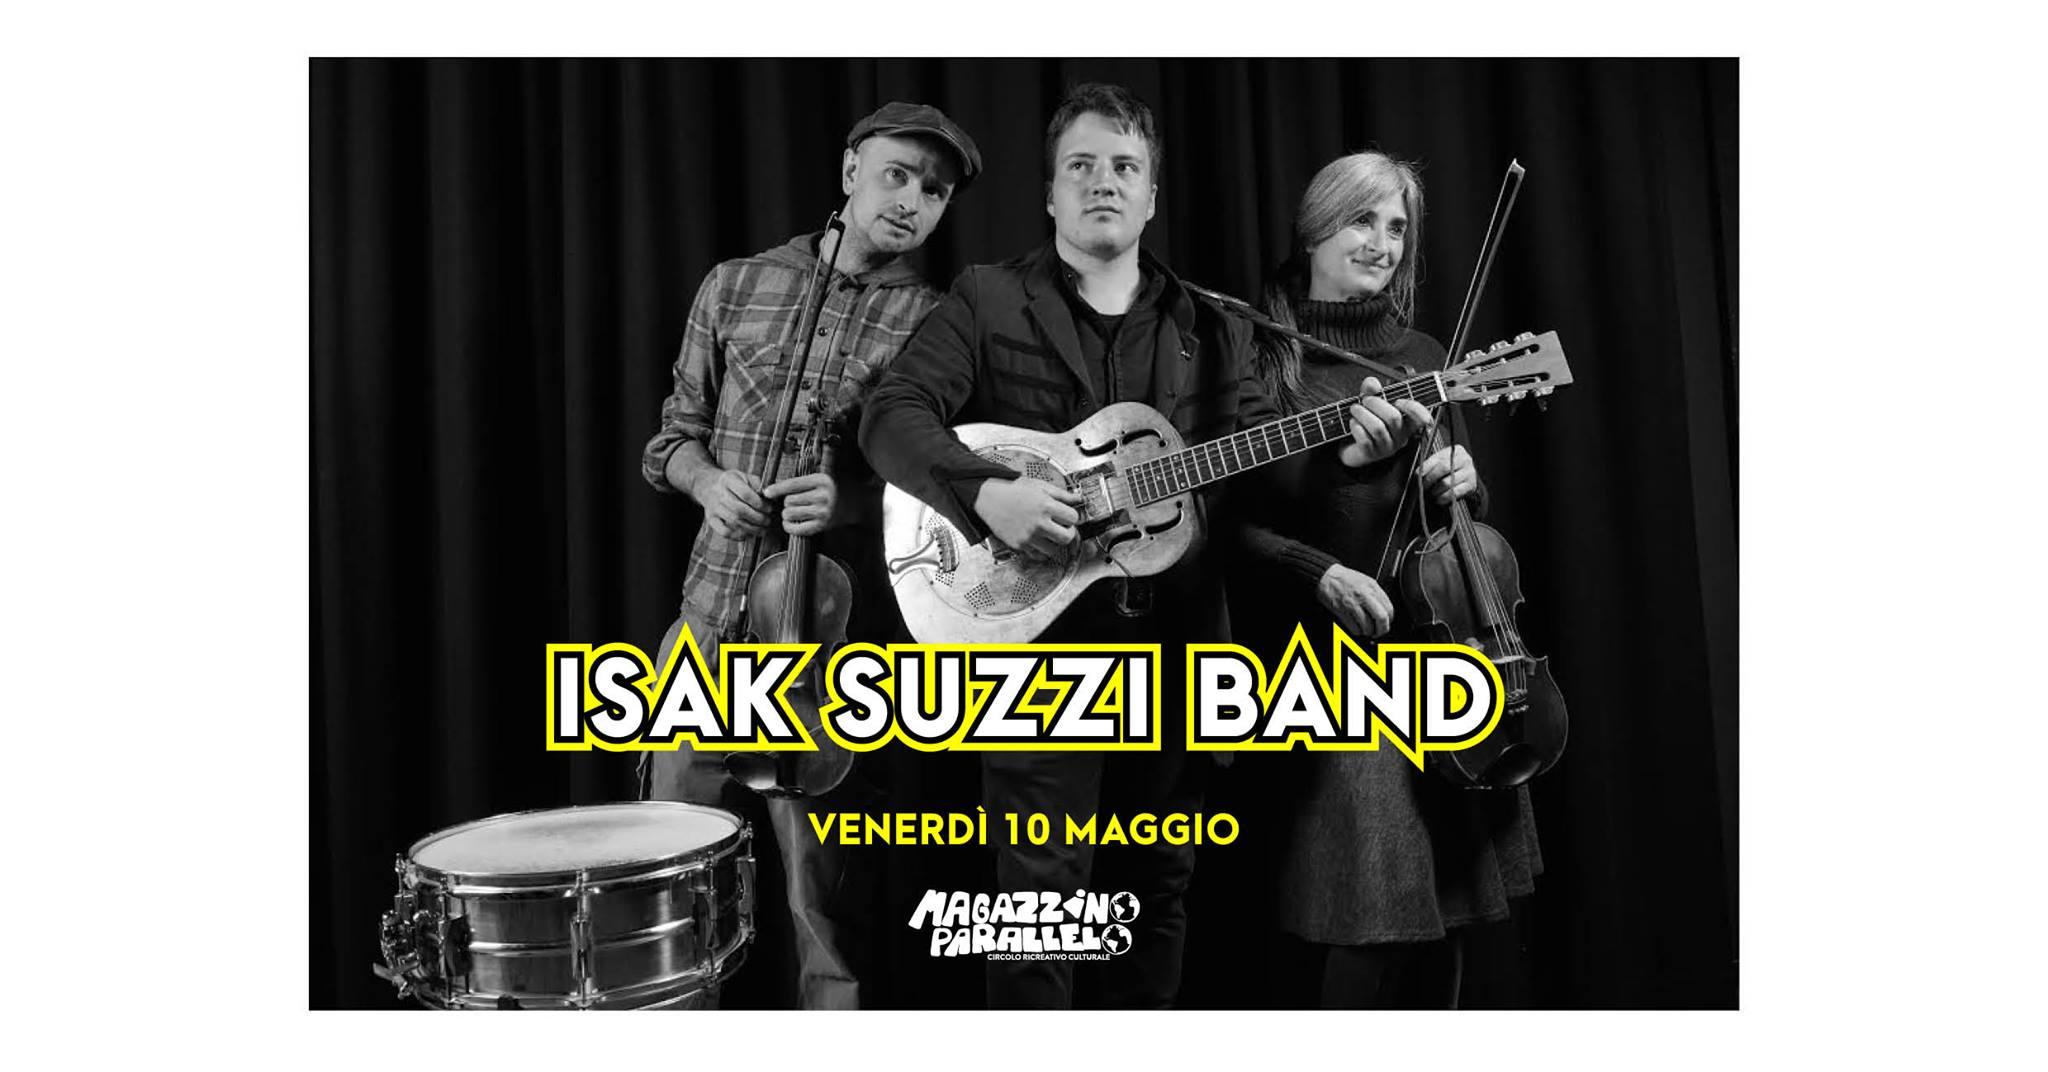 Isak Suzzi Band ⌁ Dark-Rebel-Blues / at Magazzino Parallelo